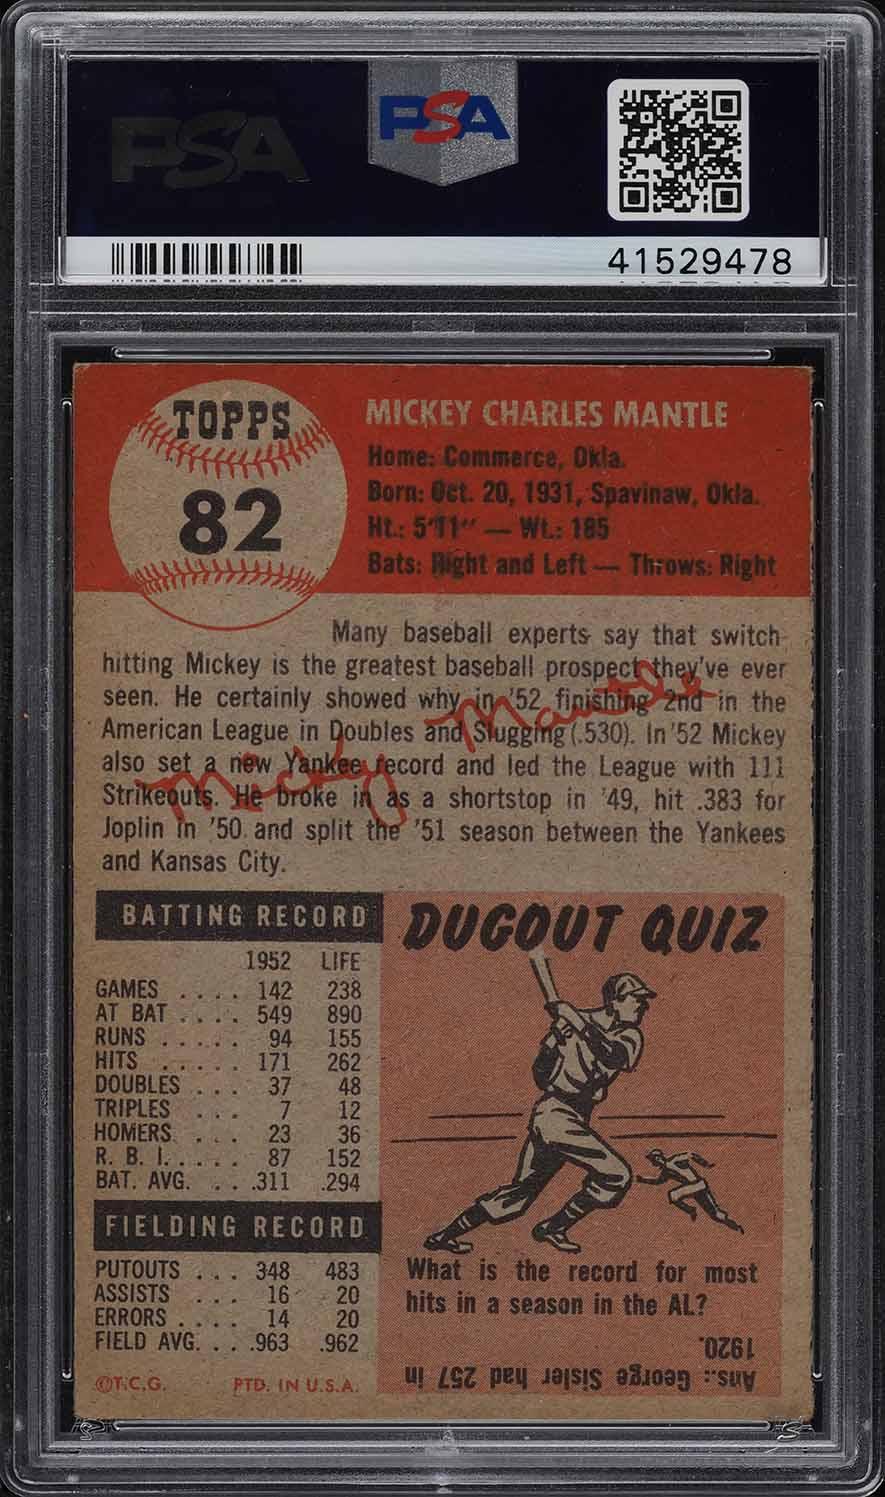 1953 Topps Mickey Mantle SHORT PRINT #82 PSA 6.5 EXMT+ (PWCC) - Image 2